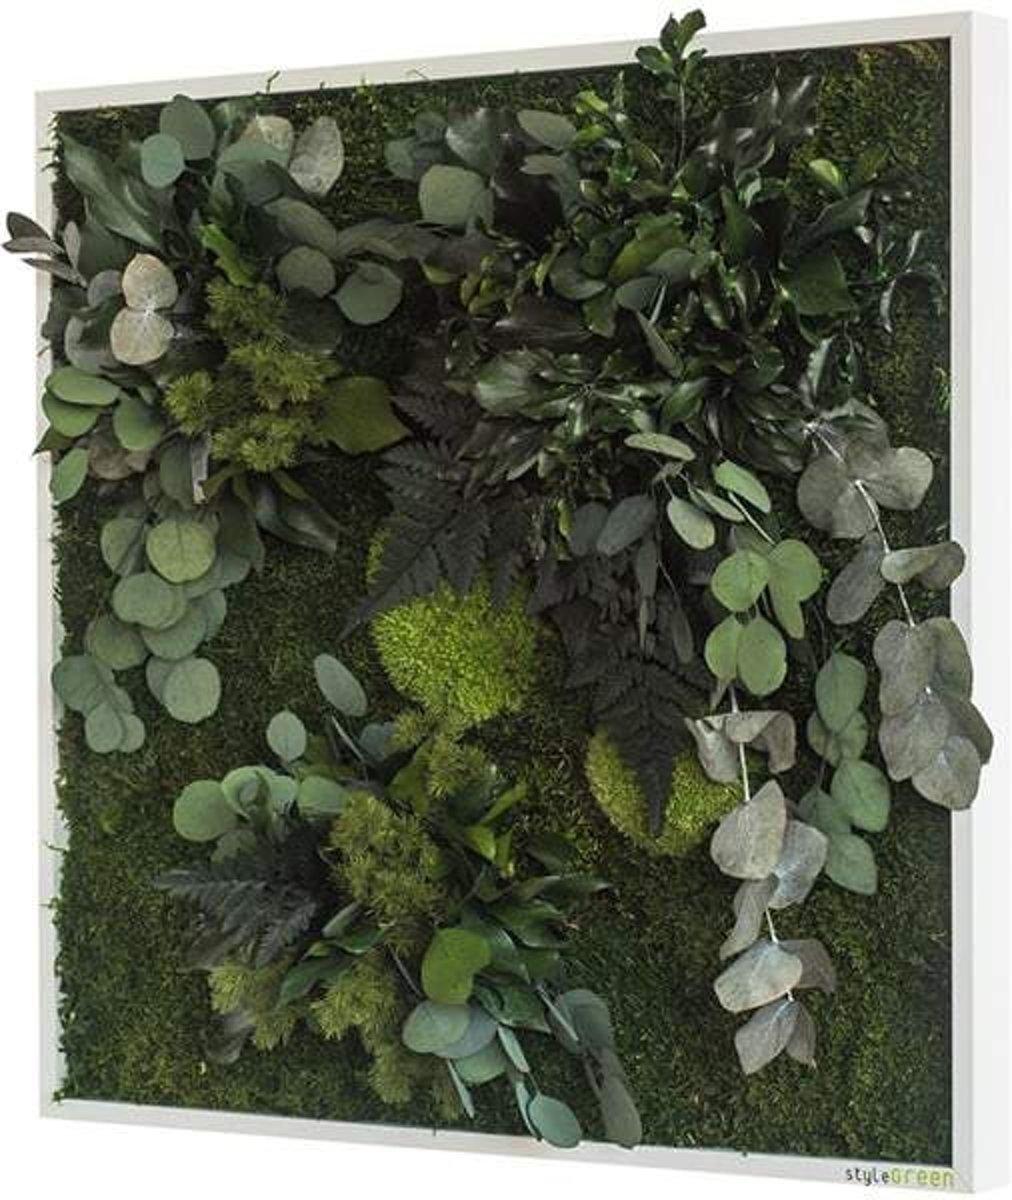 Verticale tuin - Plant islands - 55 x 55cm